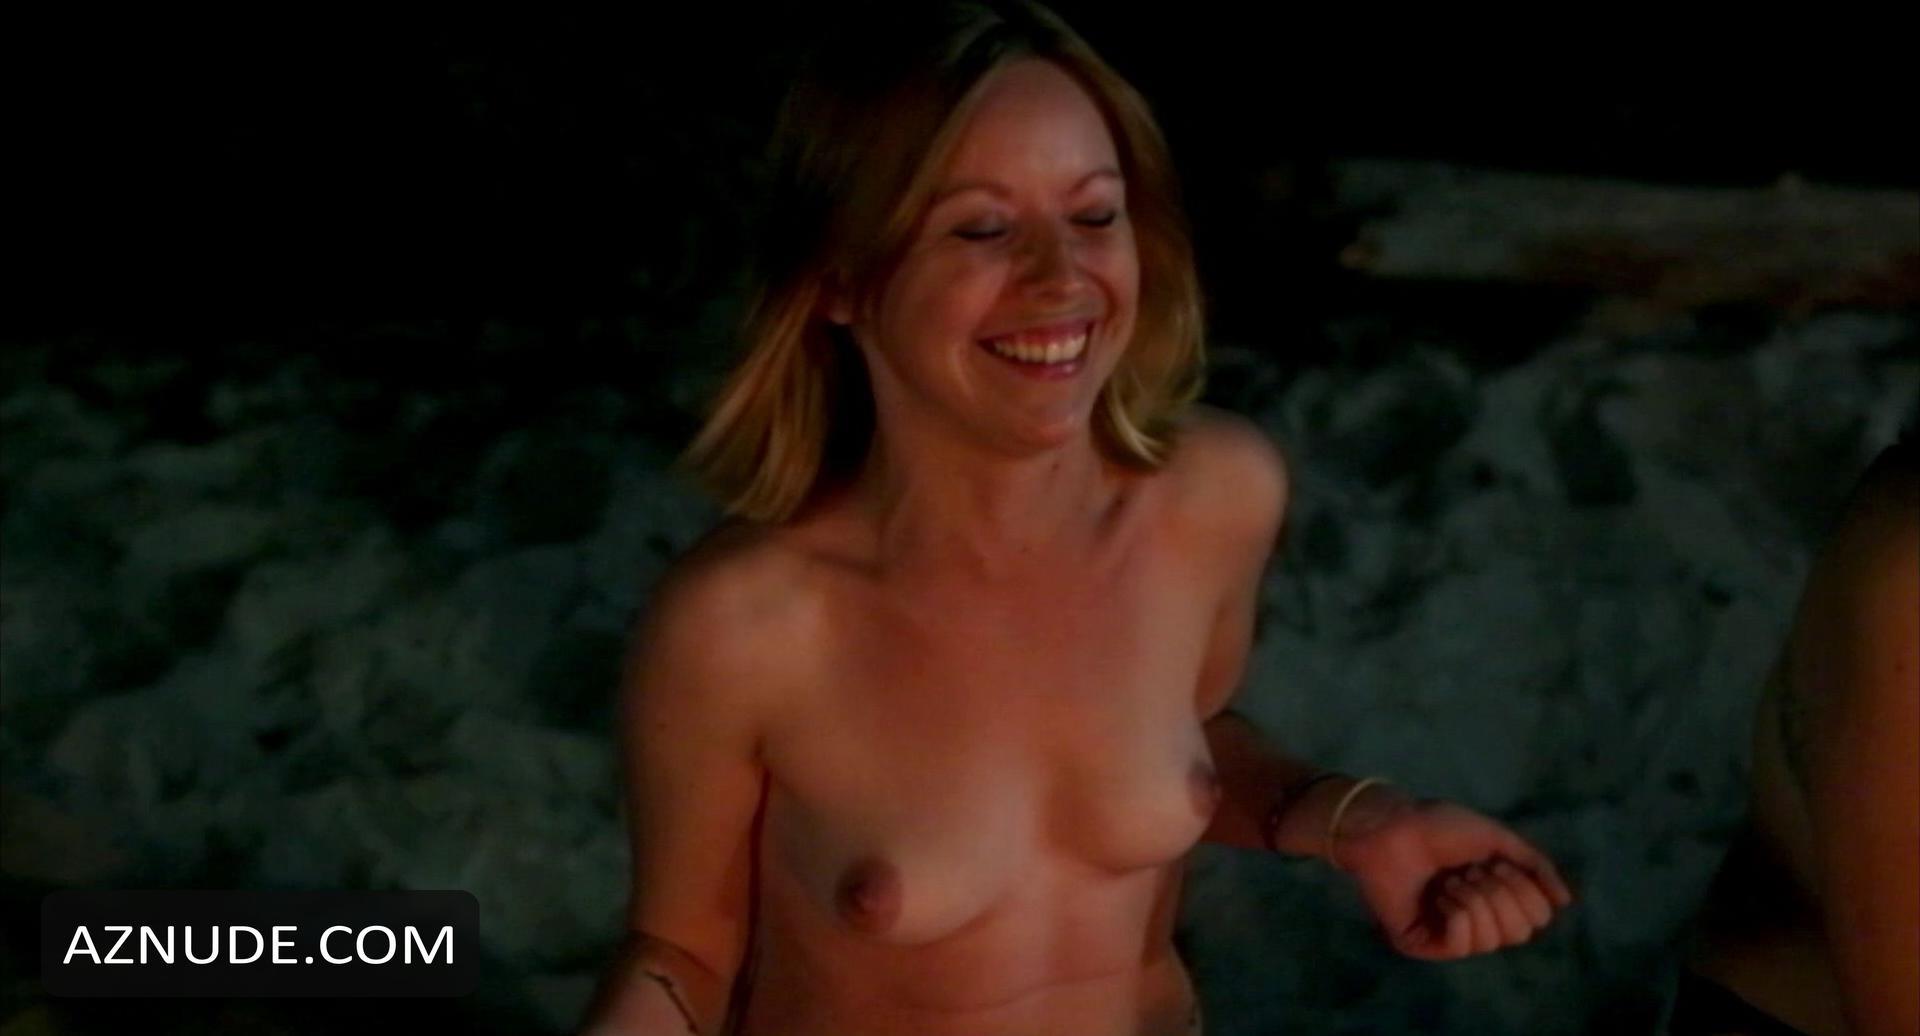 christine bell nude videos